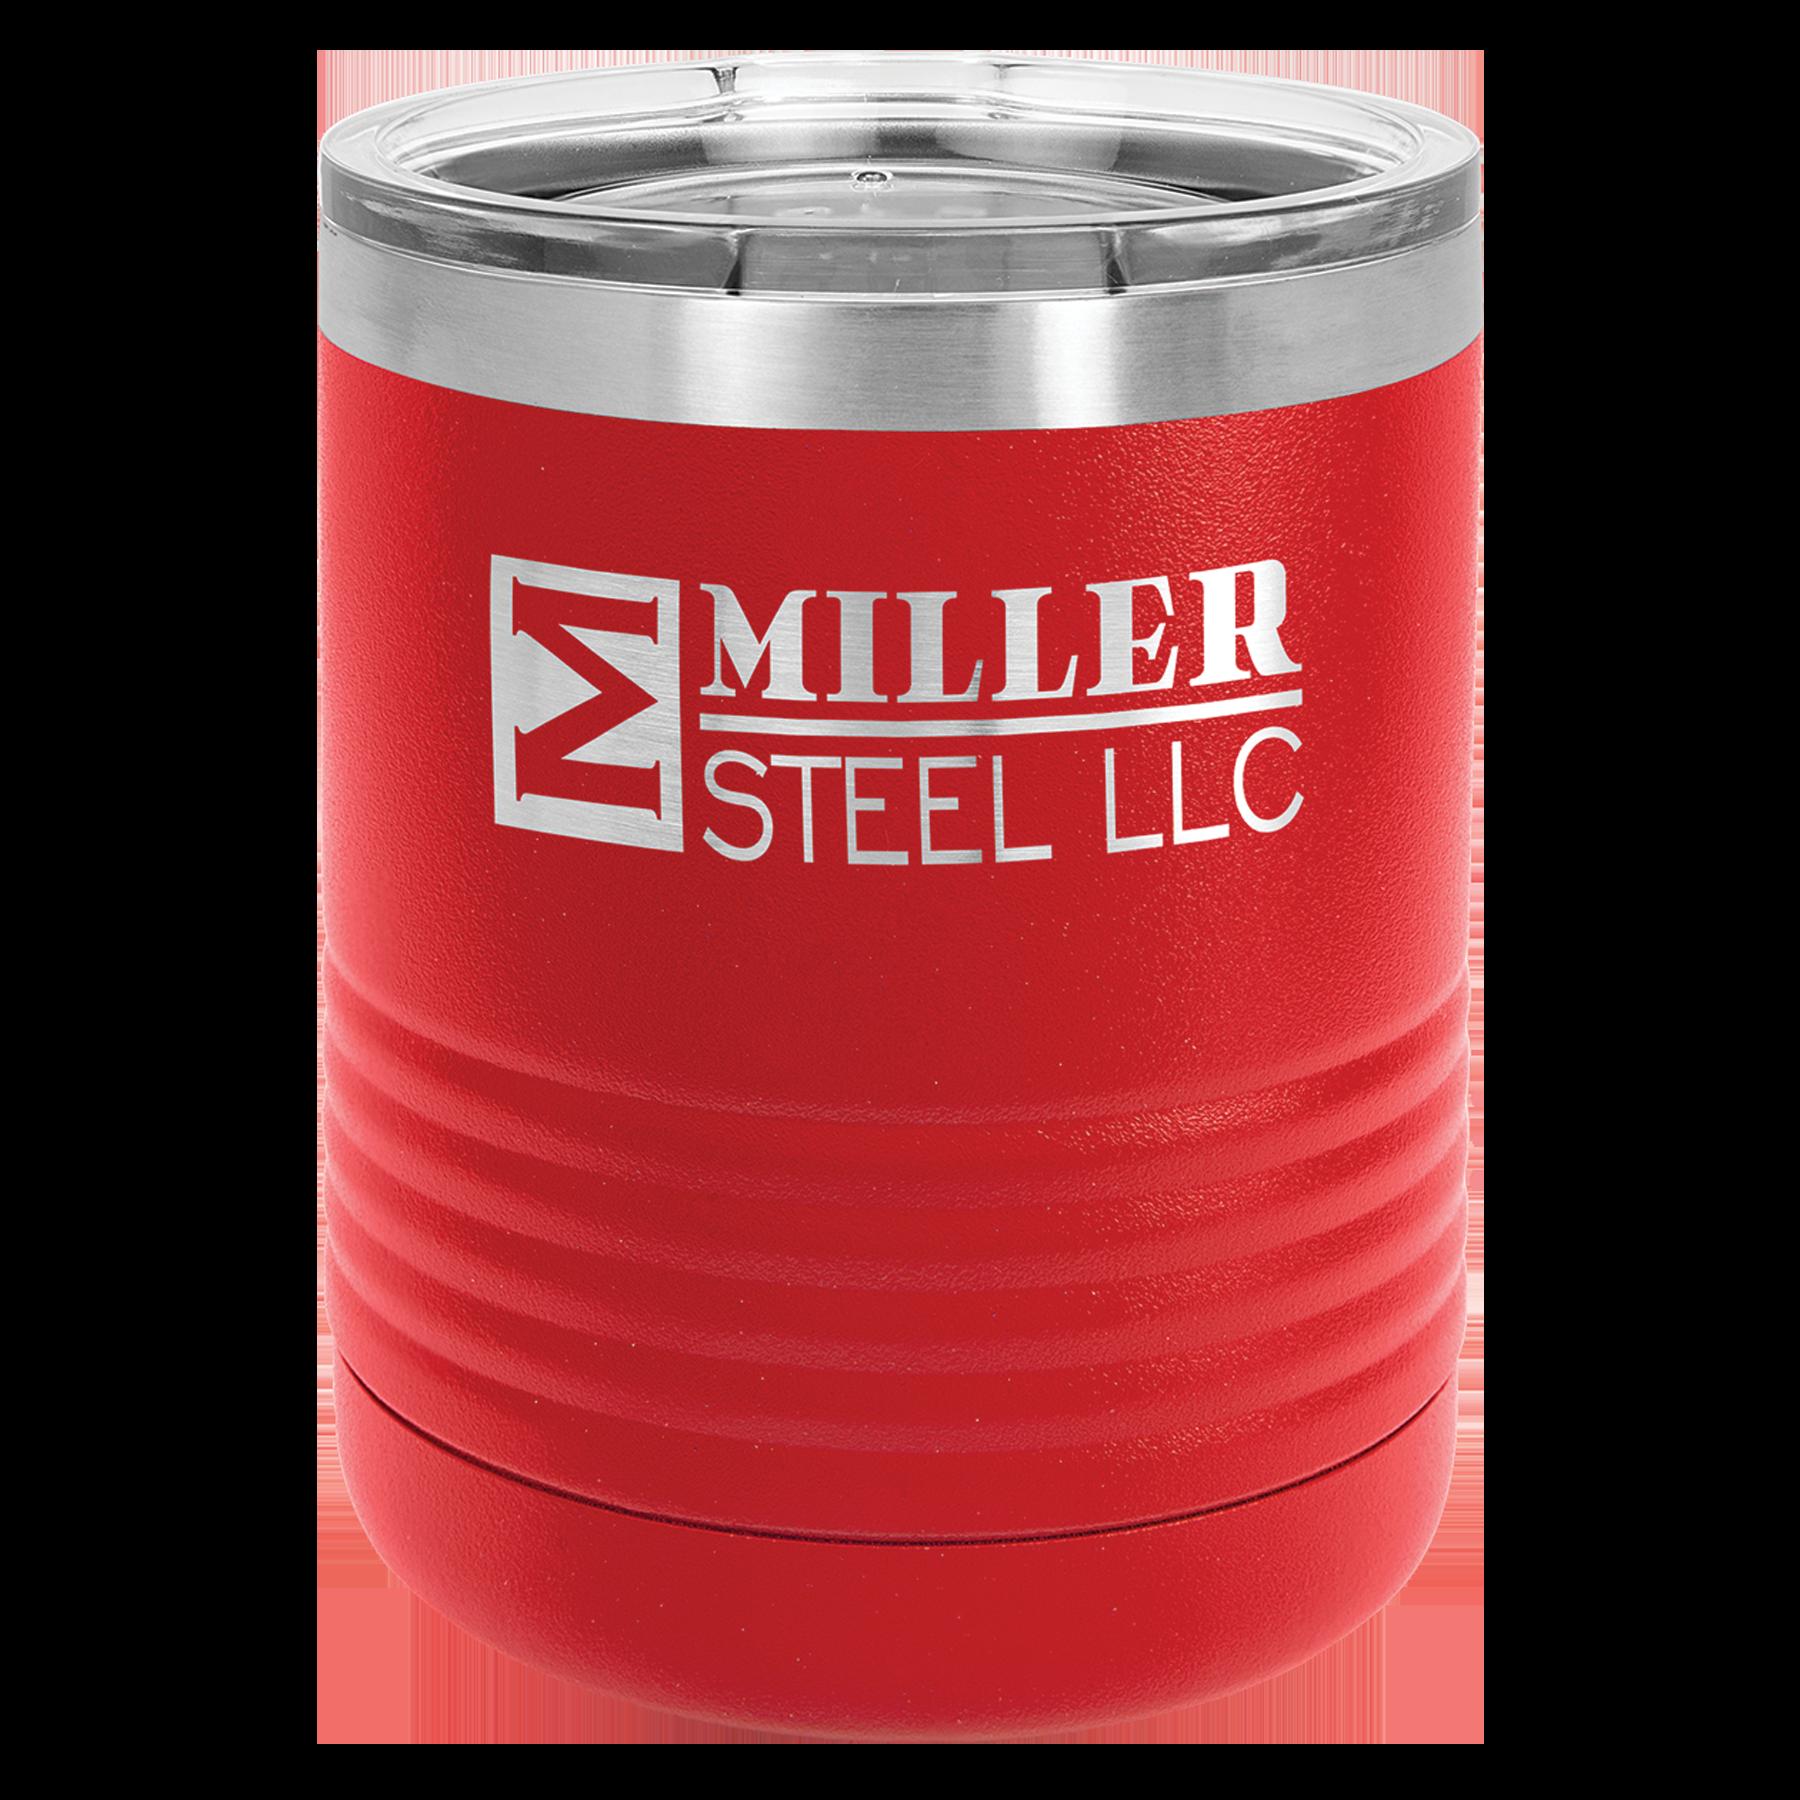 10 oz Tumbler -  Stainless Steel